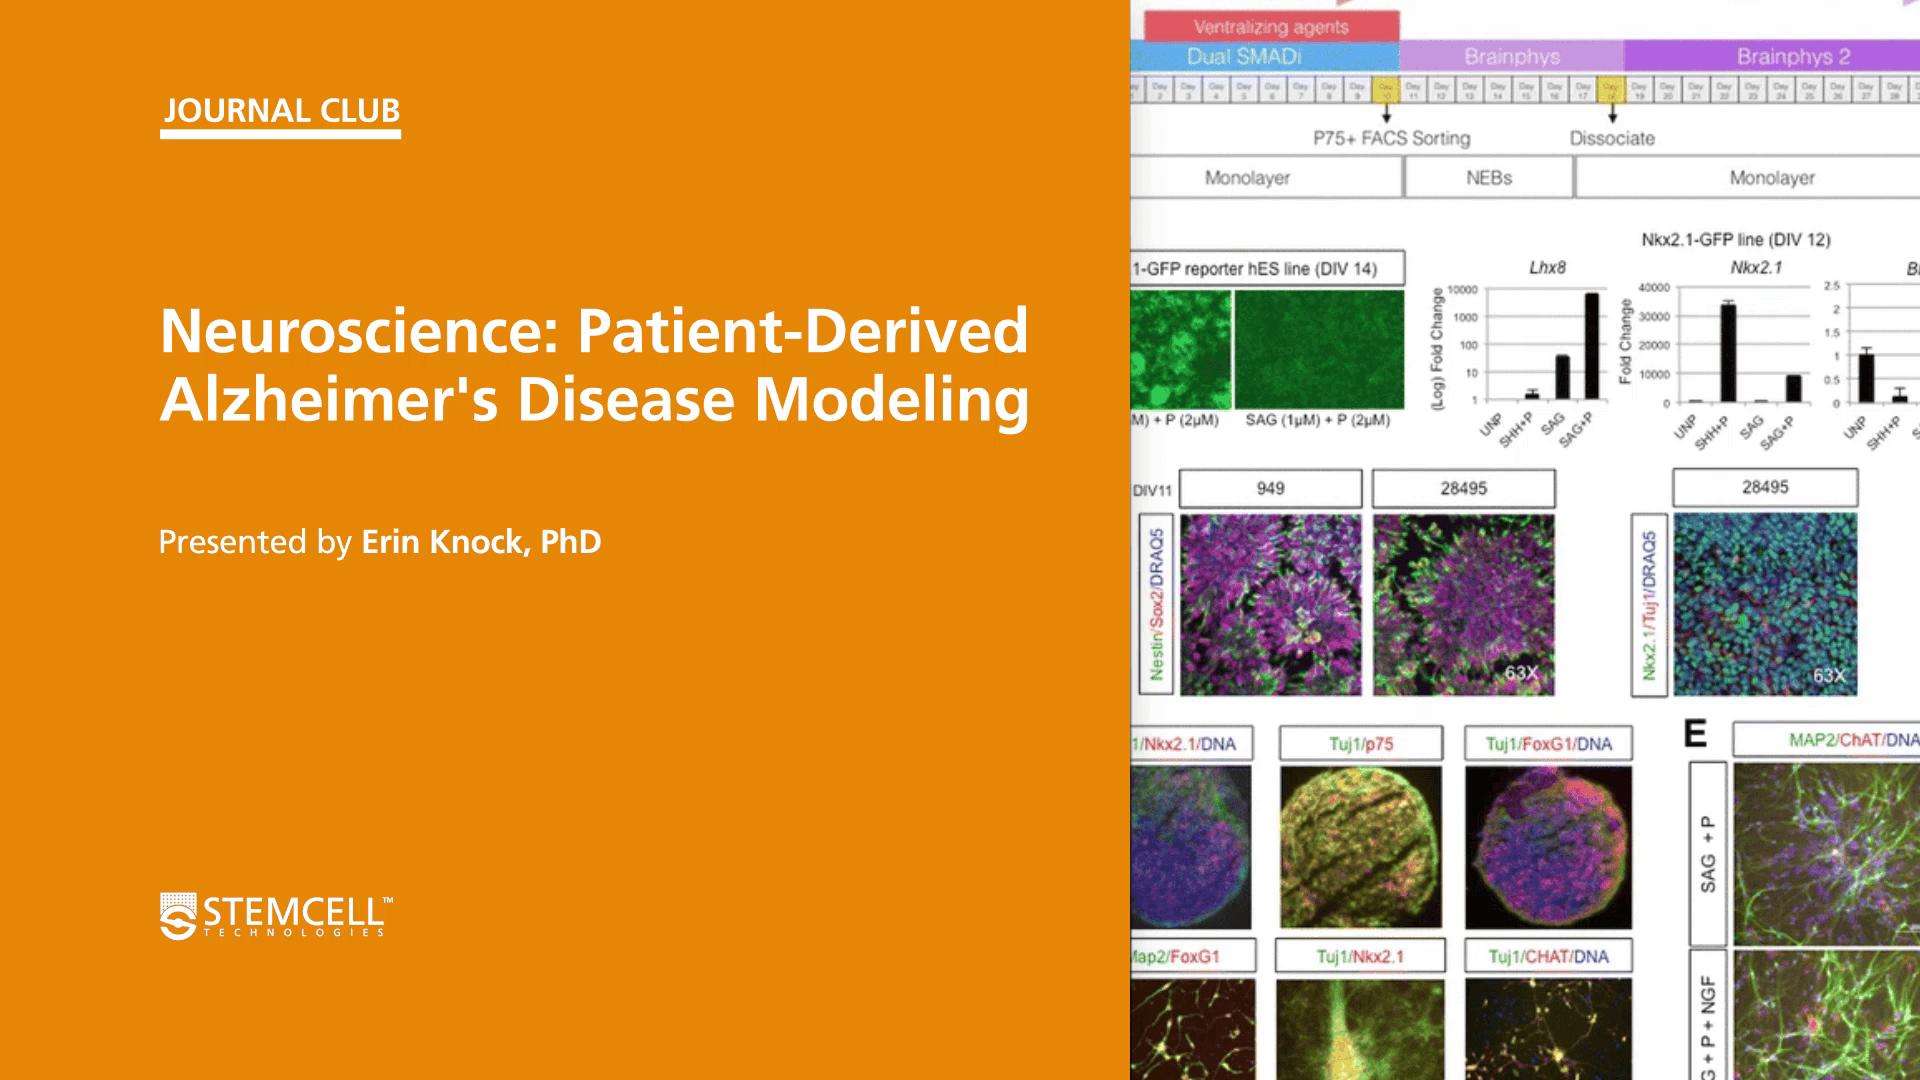 STEMCELL Journal Club: Patient-Derived Alzheimer's Disease Modeling